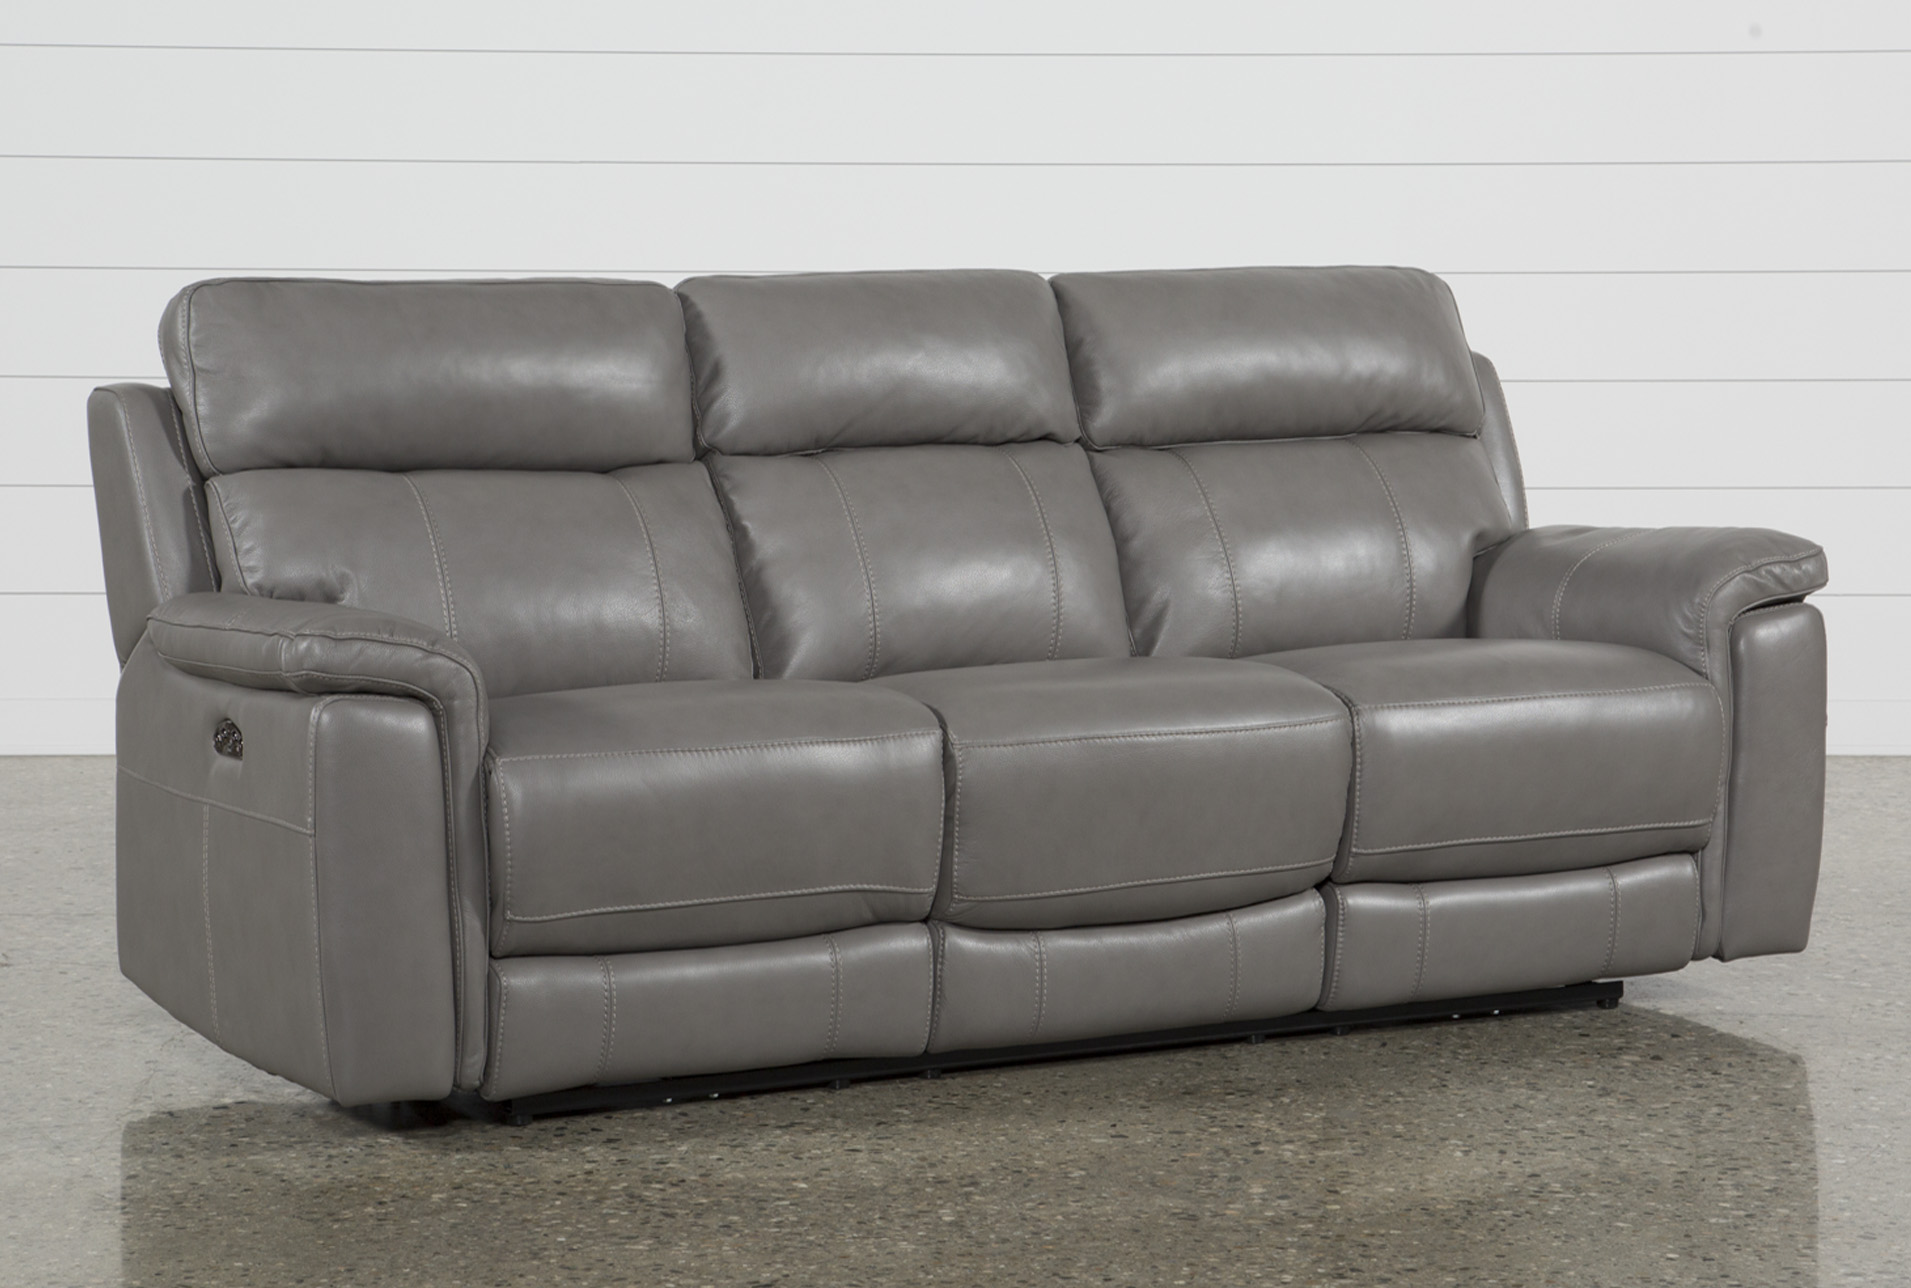 dino grey leather power reclining sofa w power headrest usb rh livingspaces com leather power reclining sofa costco leather power reclining sofa reviews